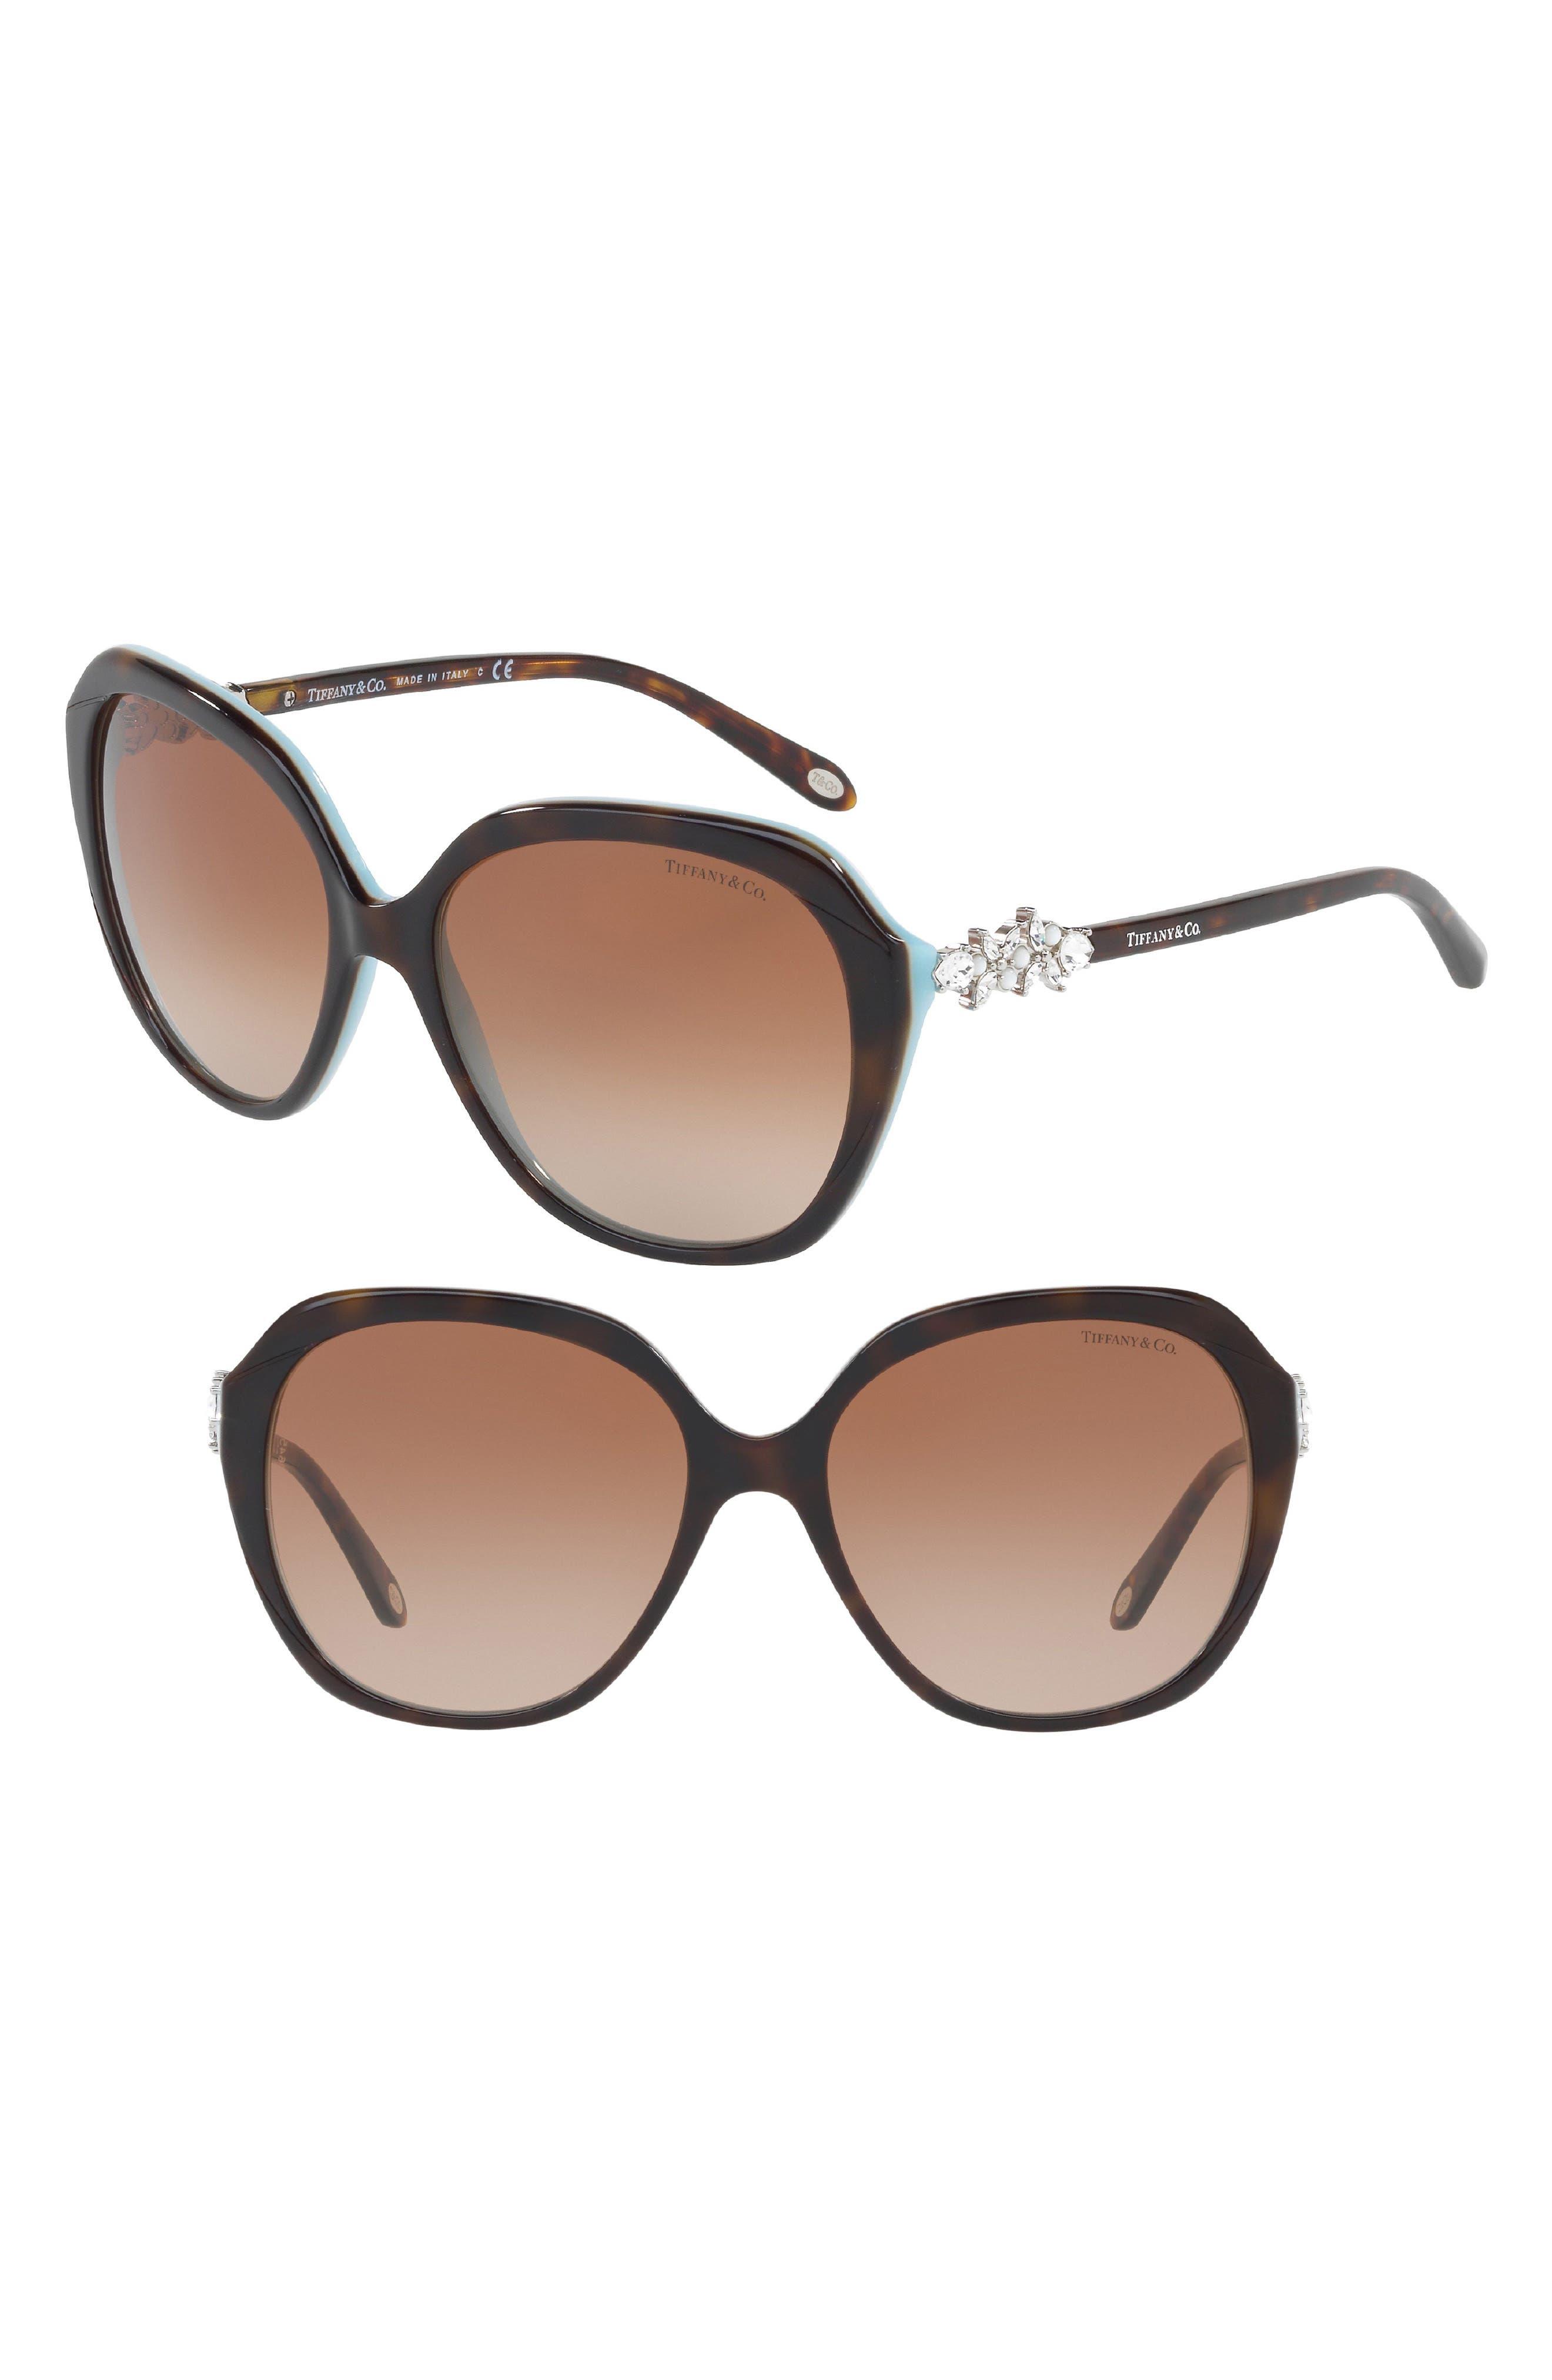 Tiffany 57mm Sunglasses,                         Main,                         color, Havana/ Blue Gradient